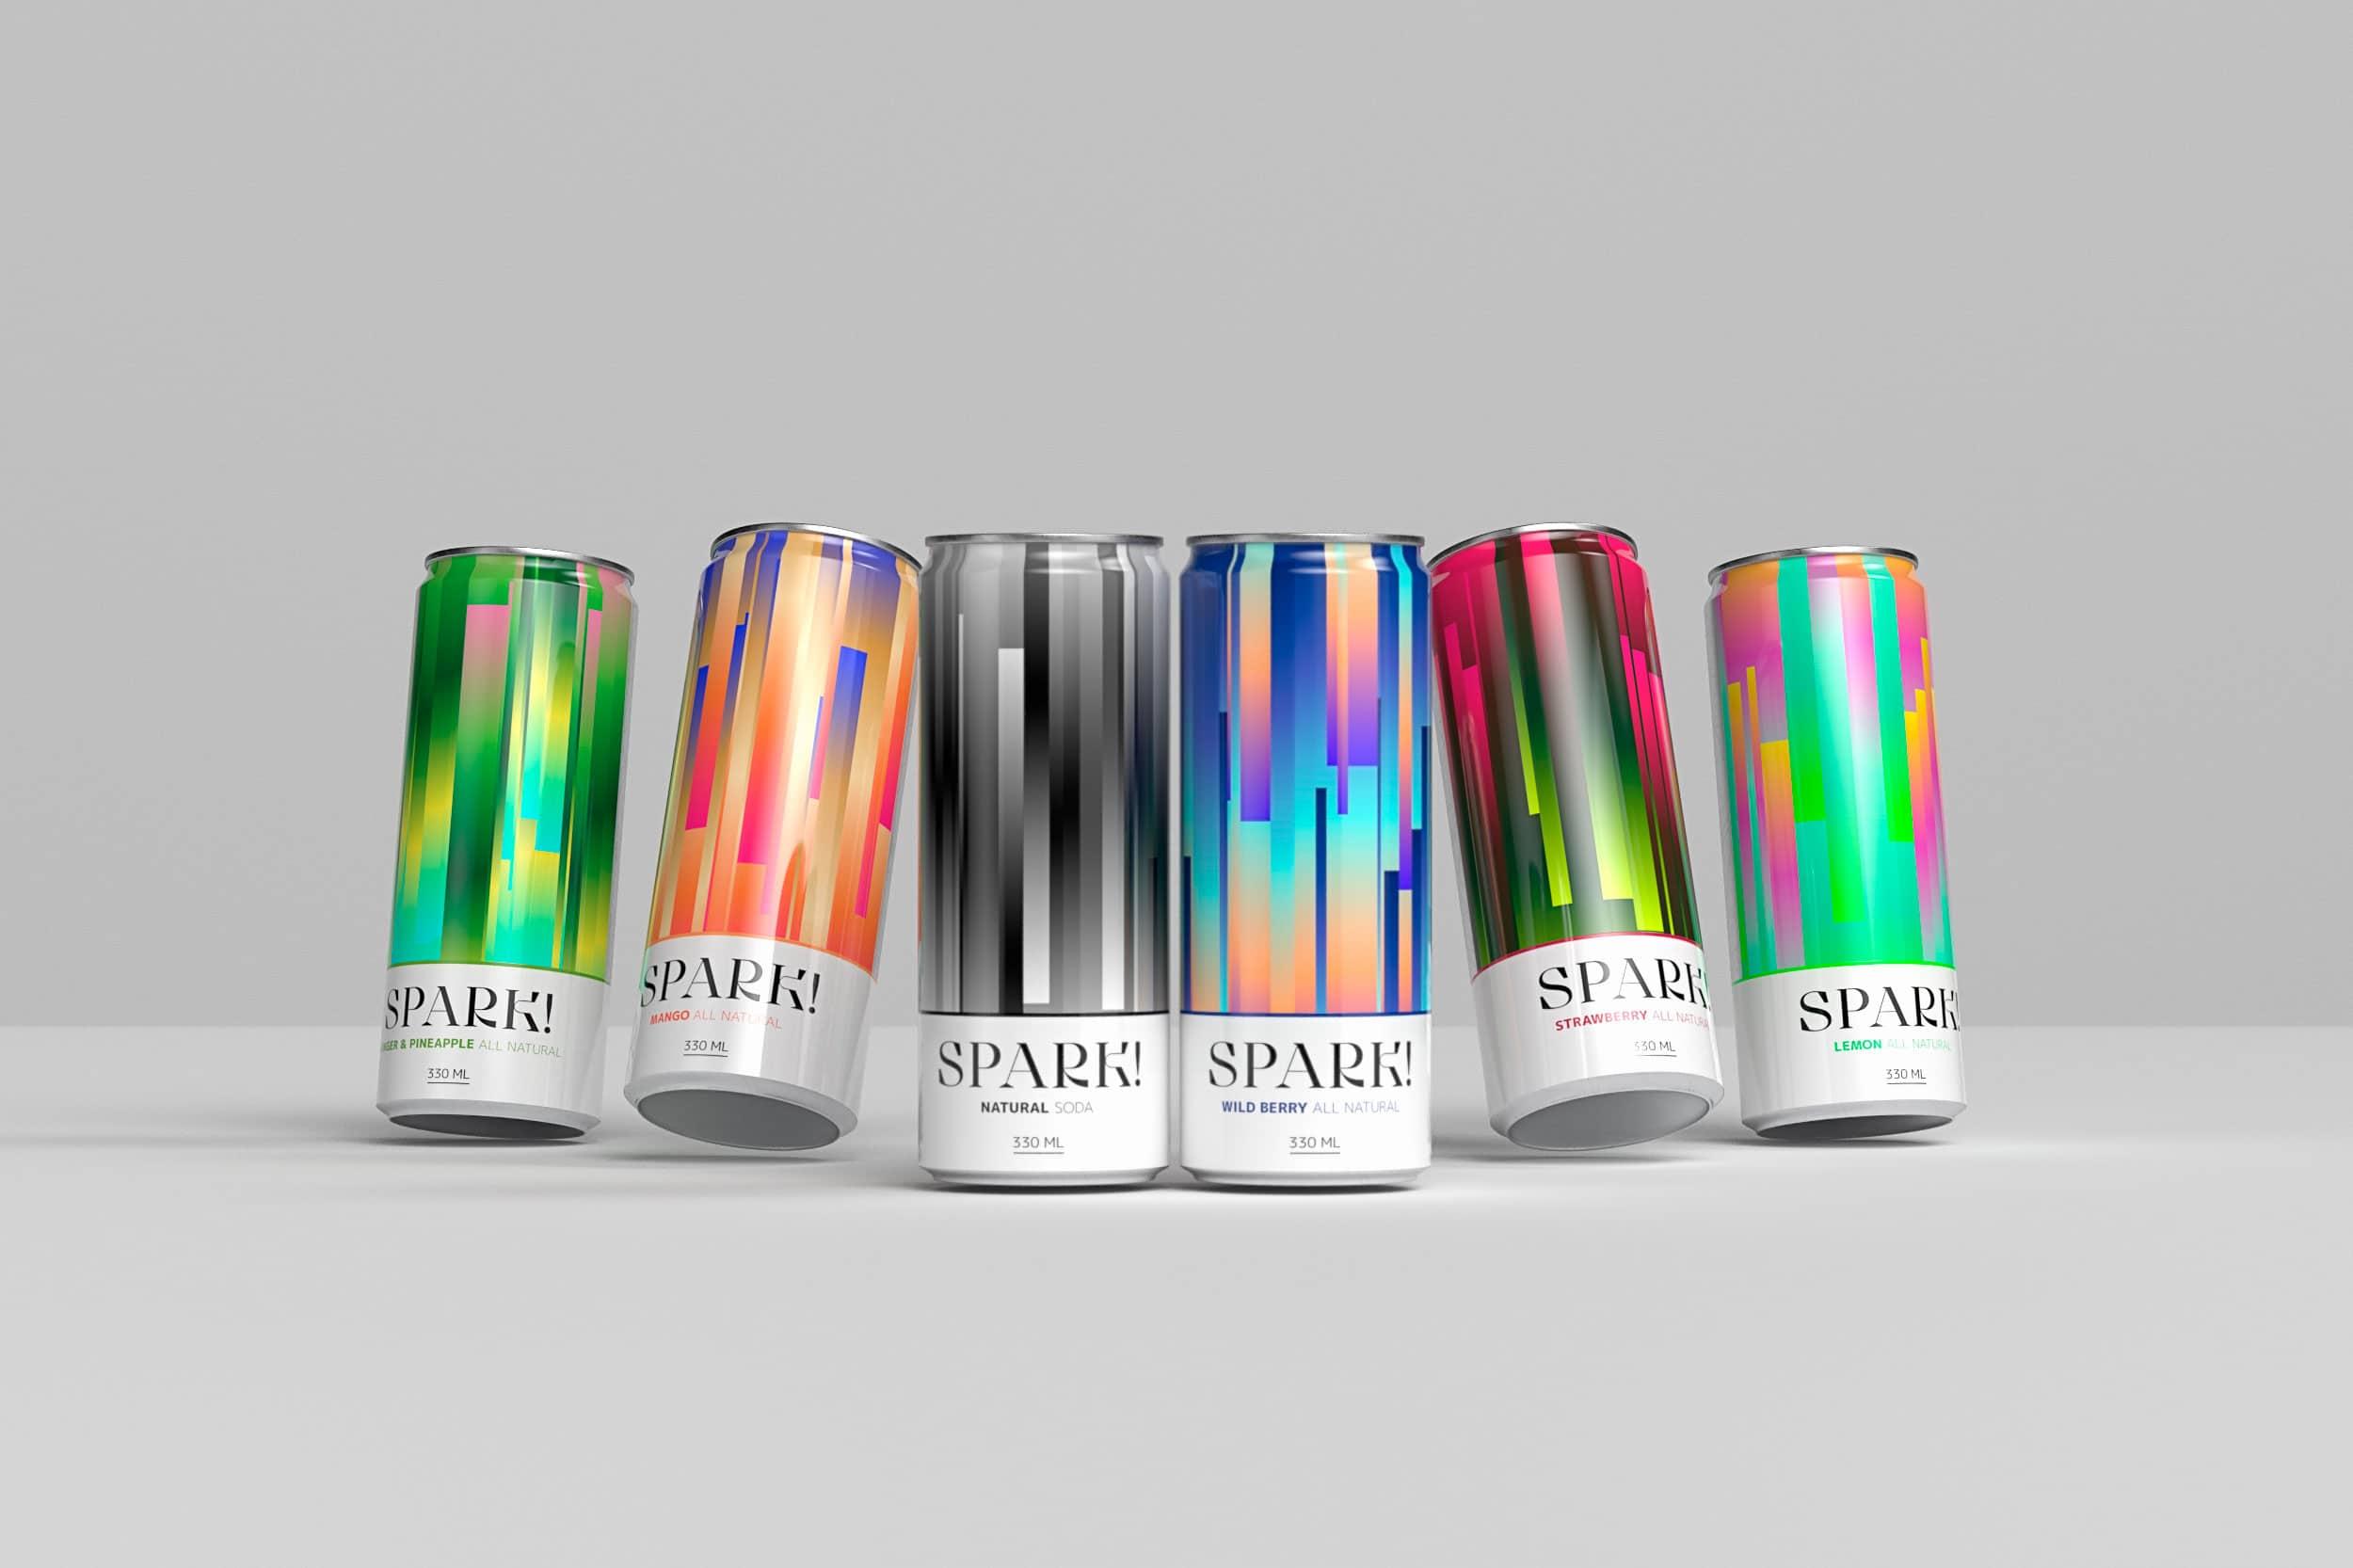 Gamme Spark! 6 canettes, 6 parfums !